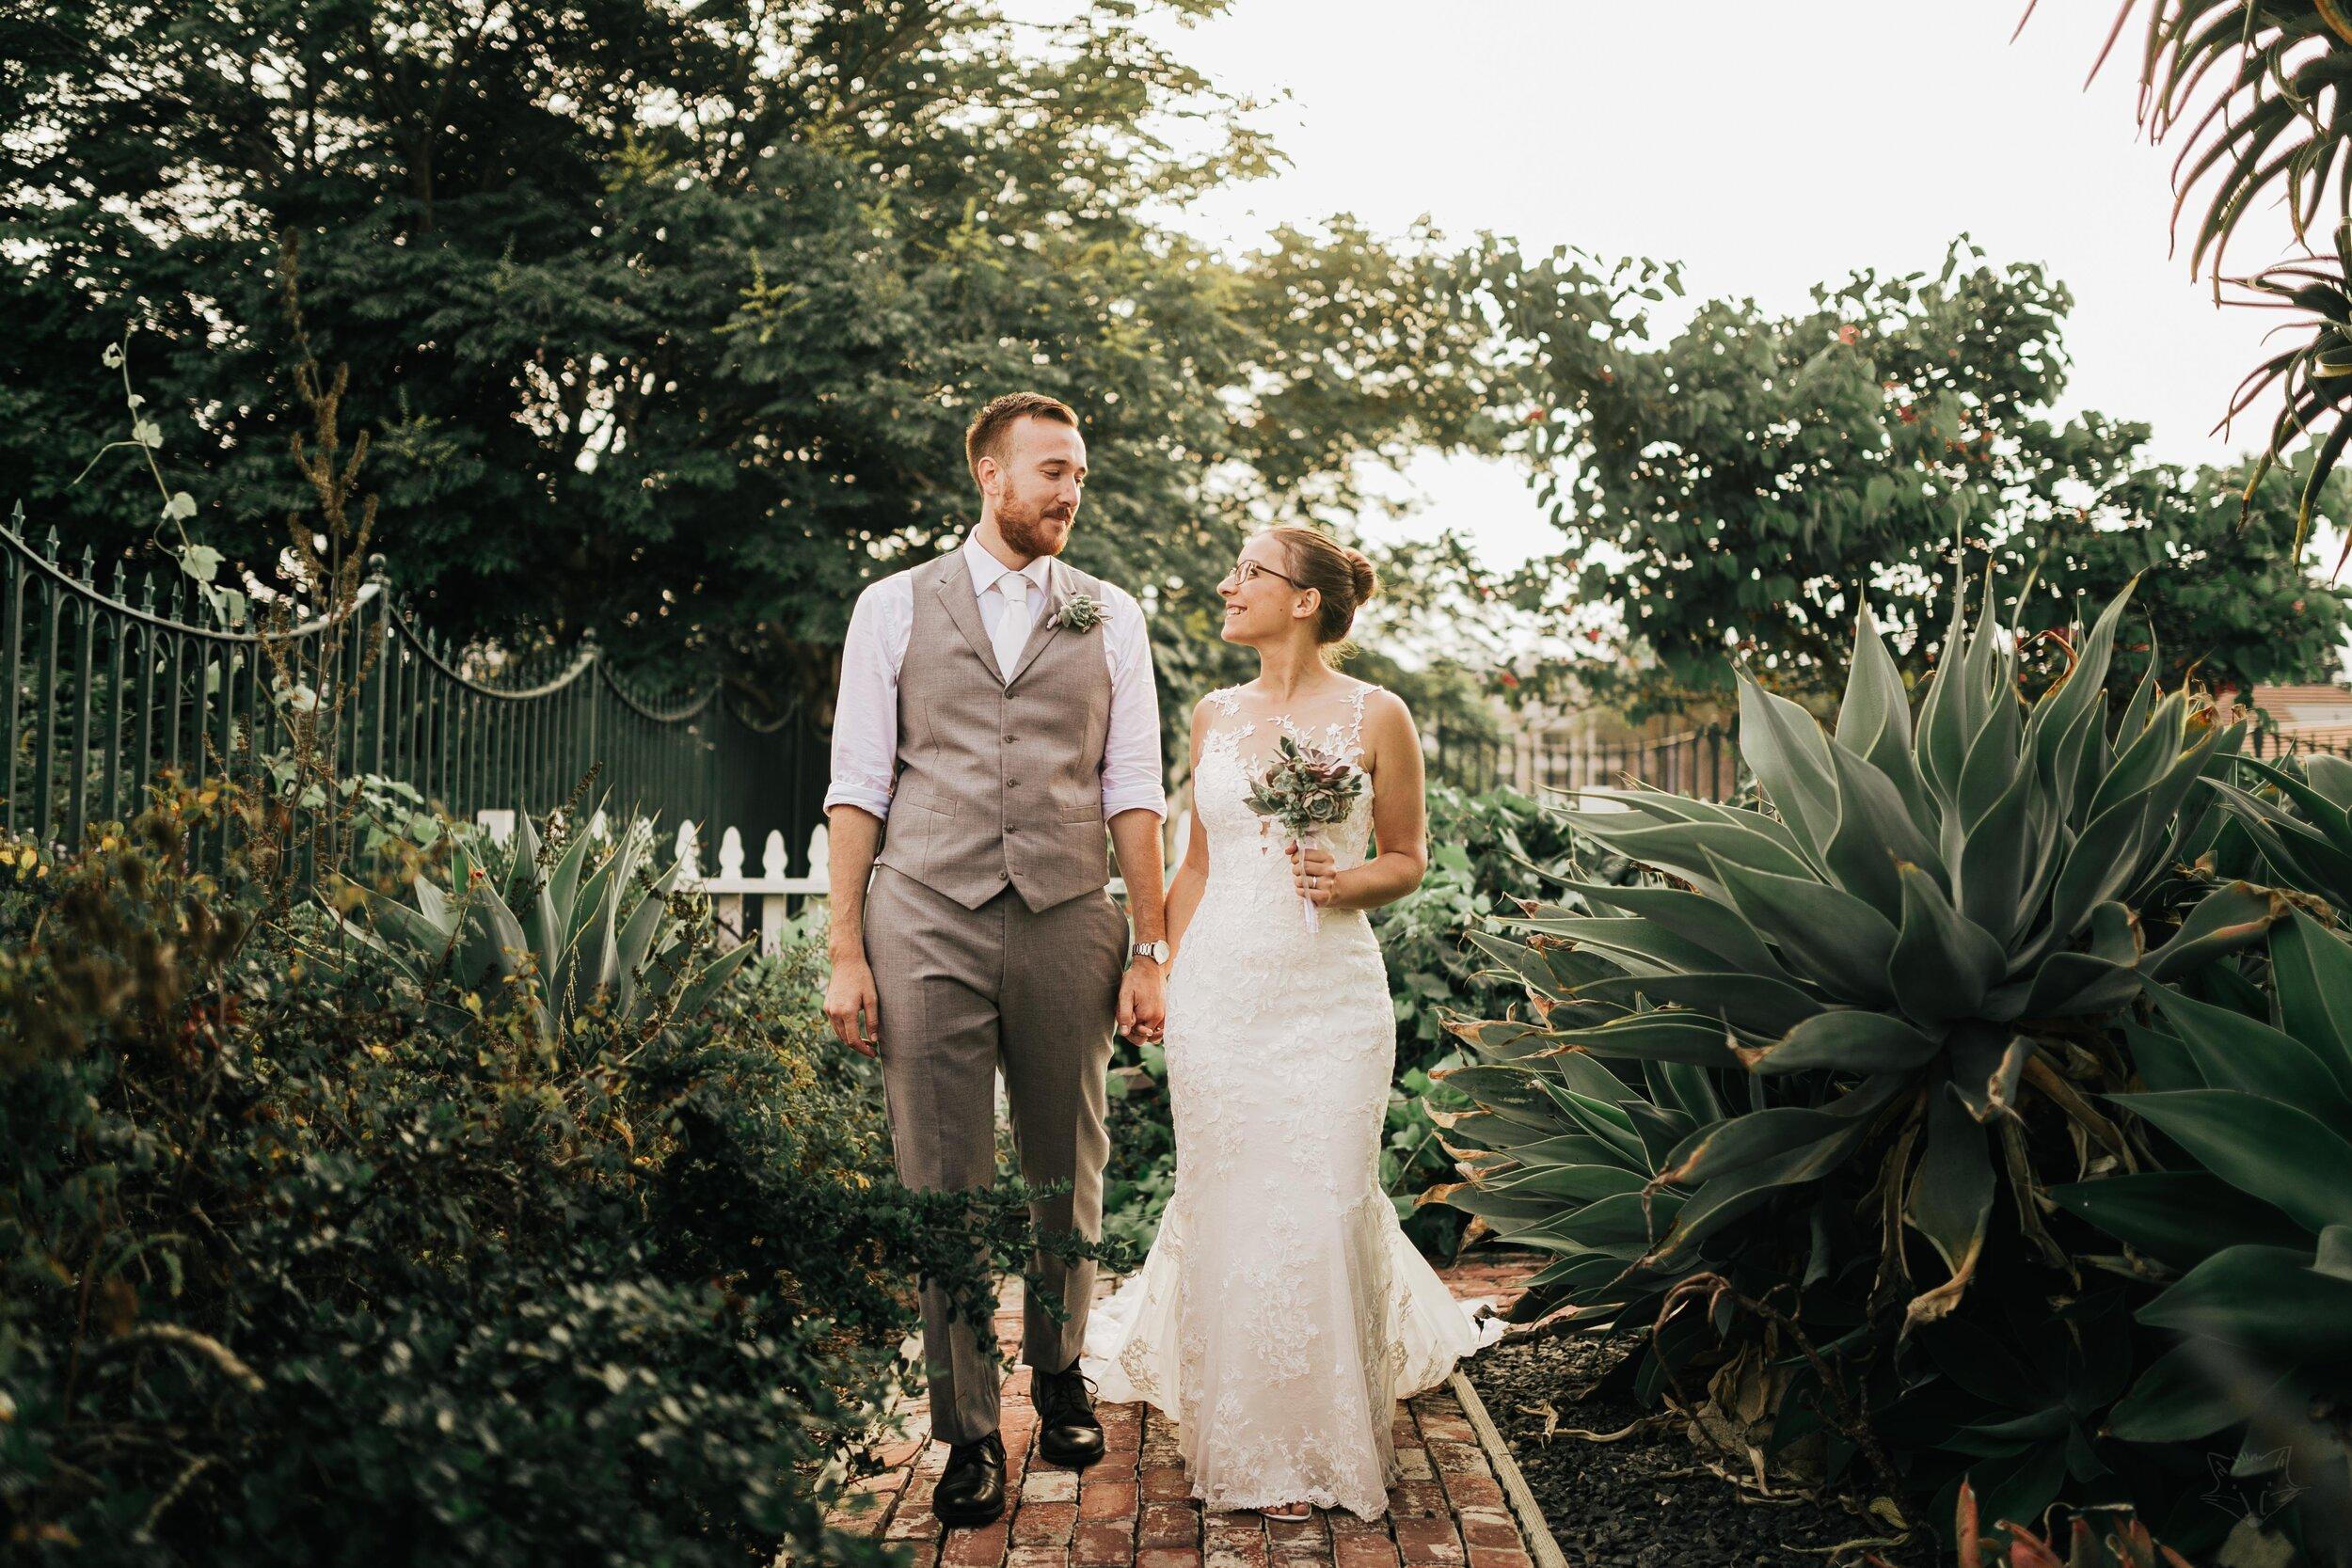 newland_barn_hungtington_beach__photoshoot_joshuachun_wedding-1247.jpg